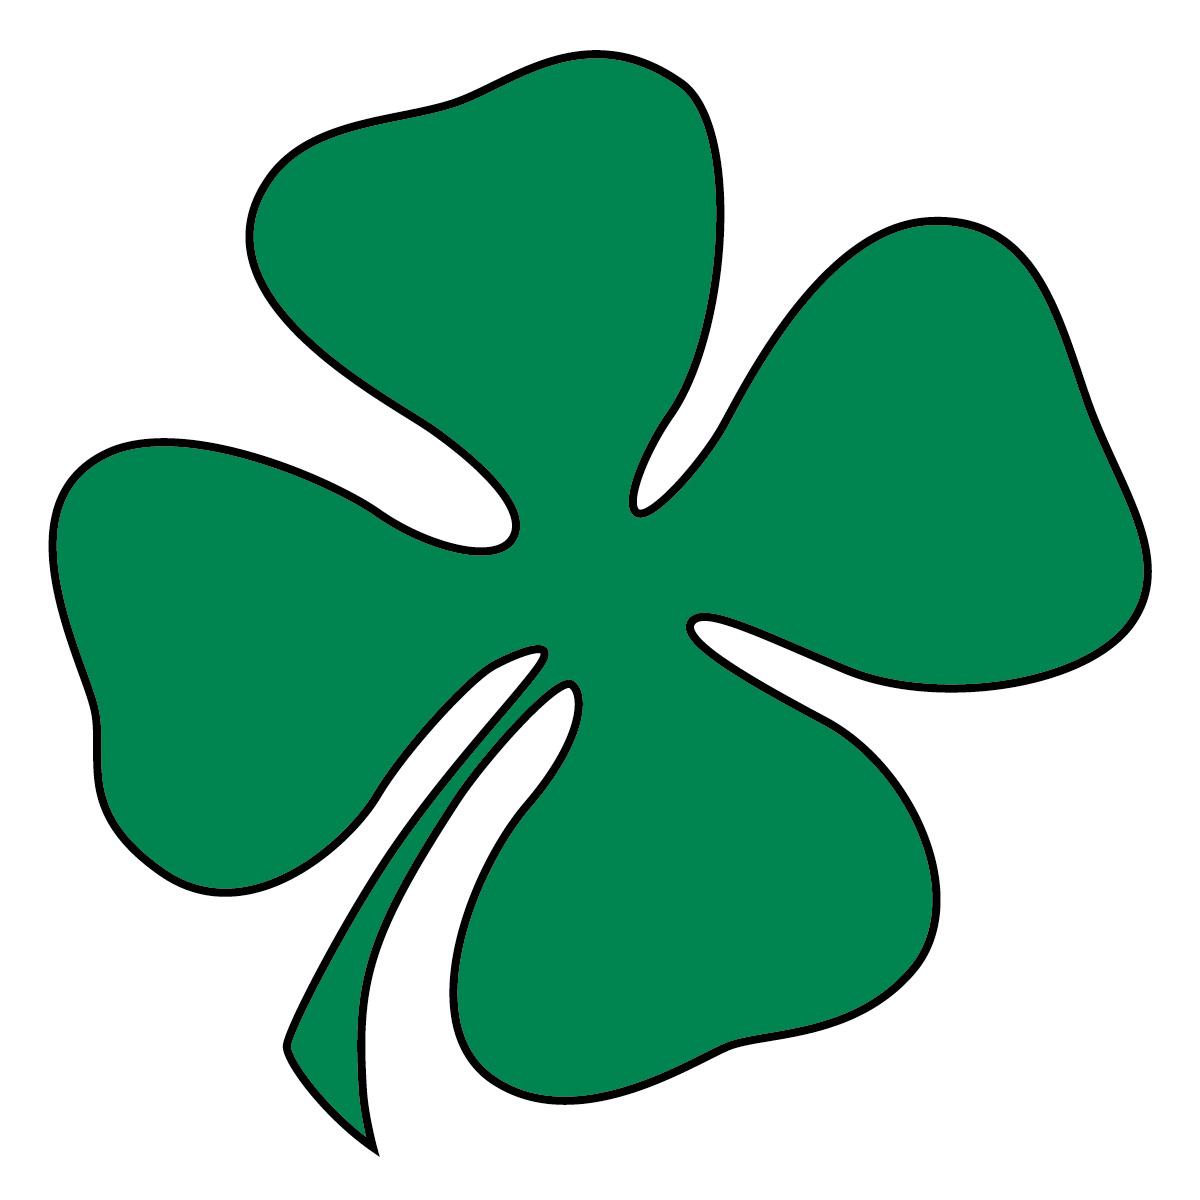 1200x1200 Irish Ireland Clip Art Free Clipart Images 2